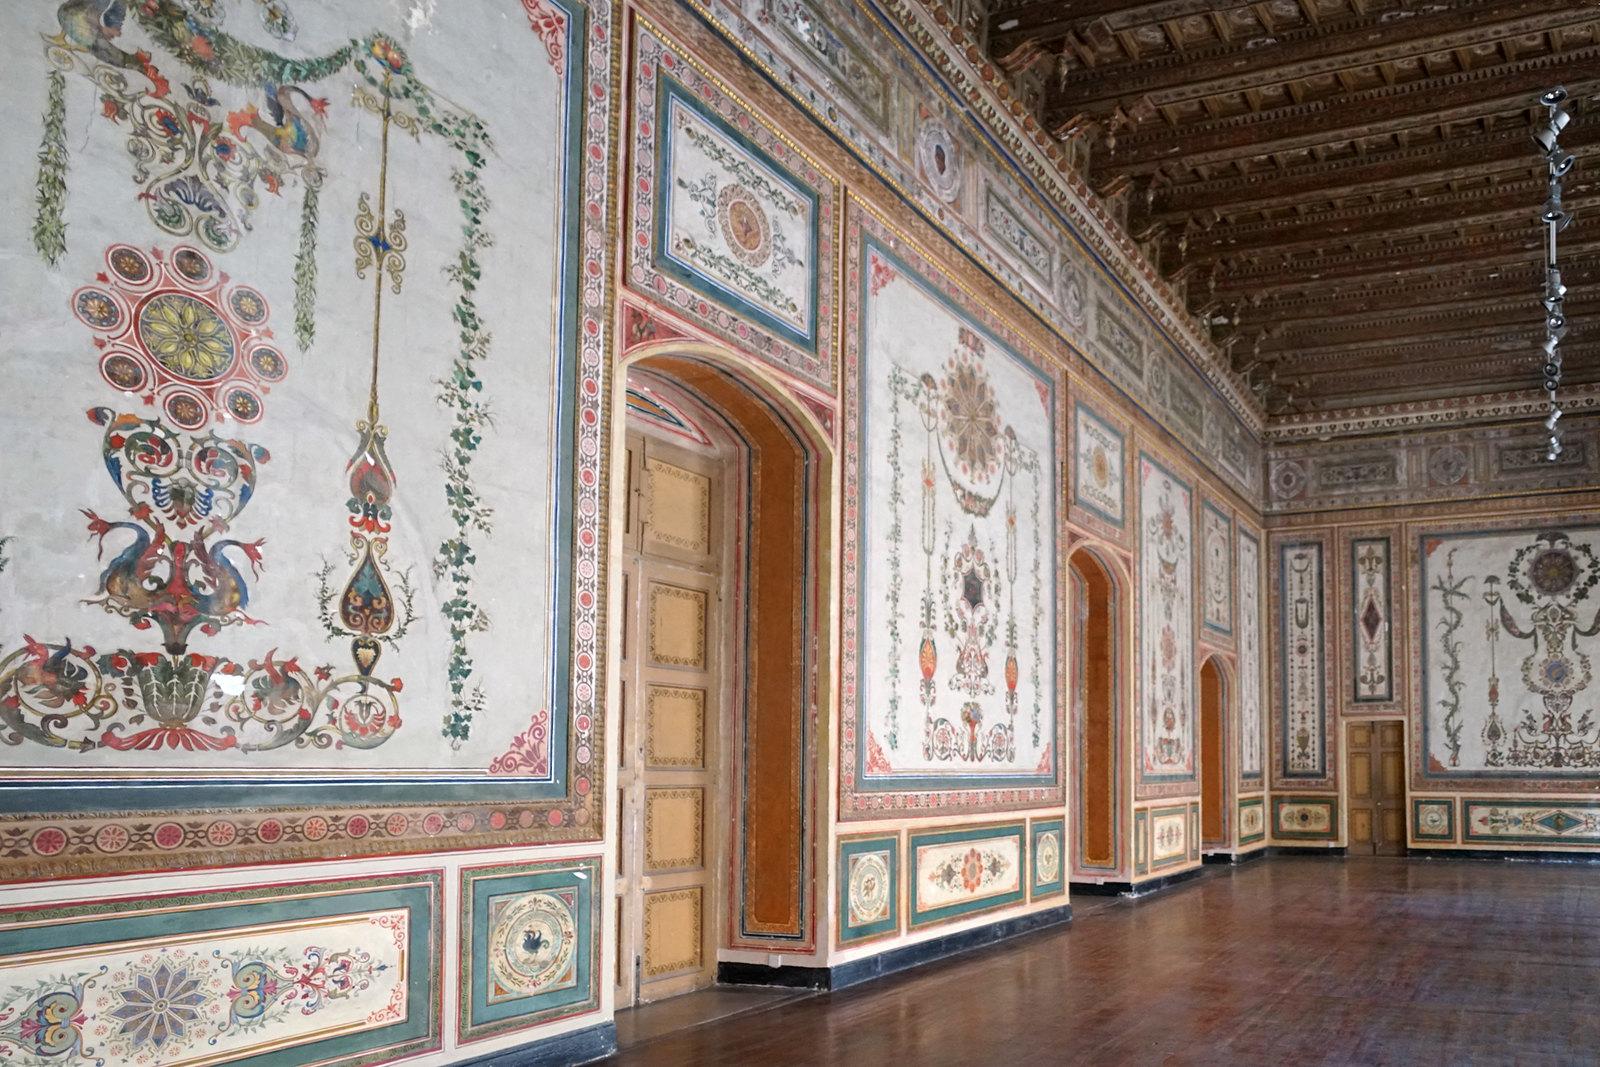 Le grand salon de l'Auberge de Provence (La Valette, Malte)